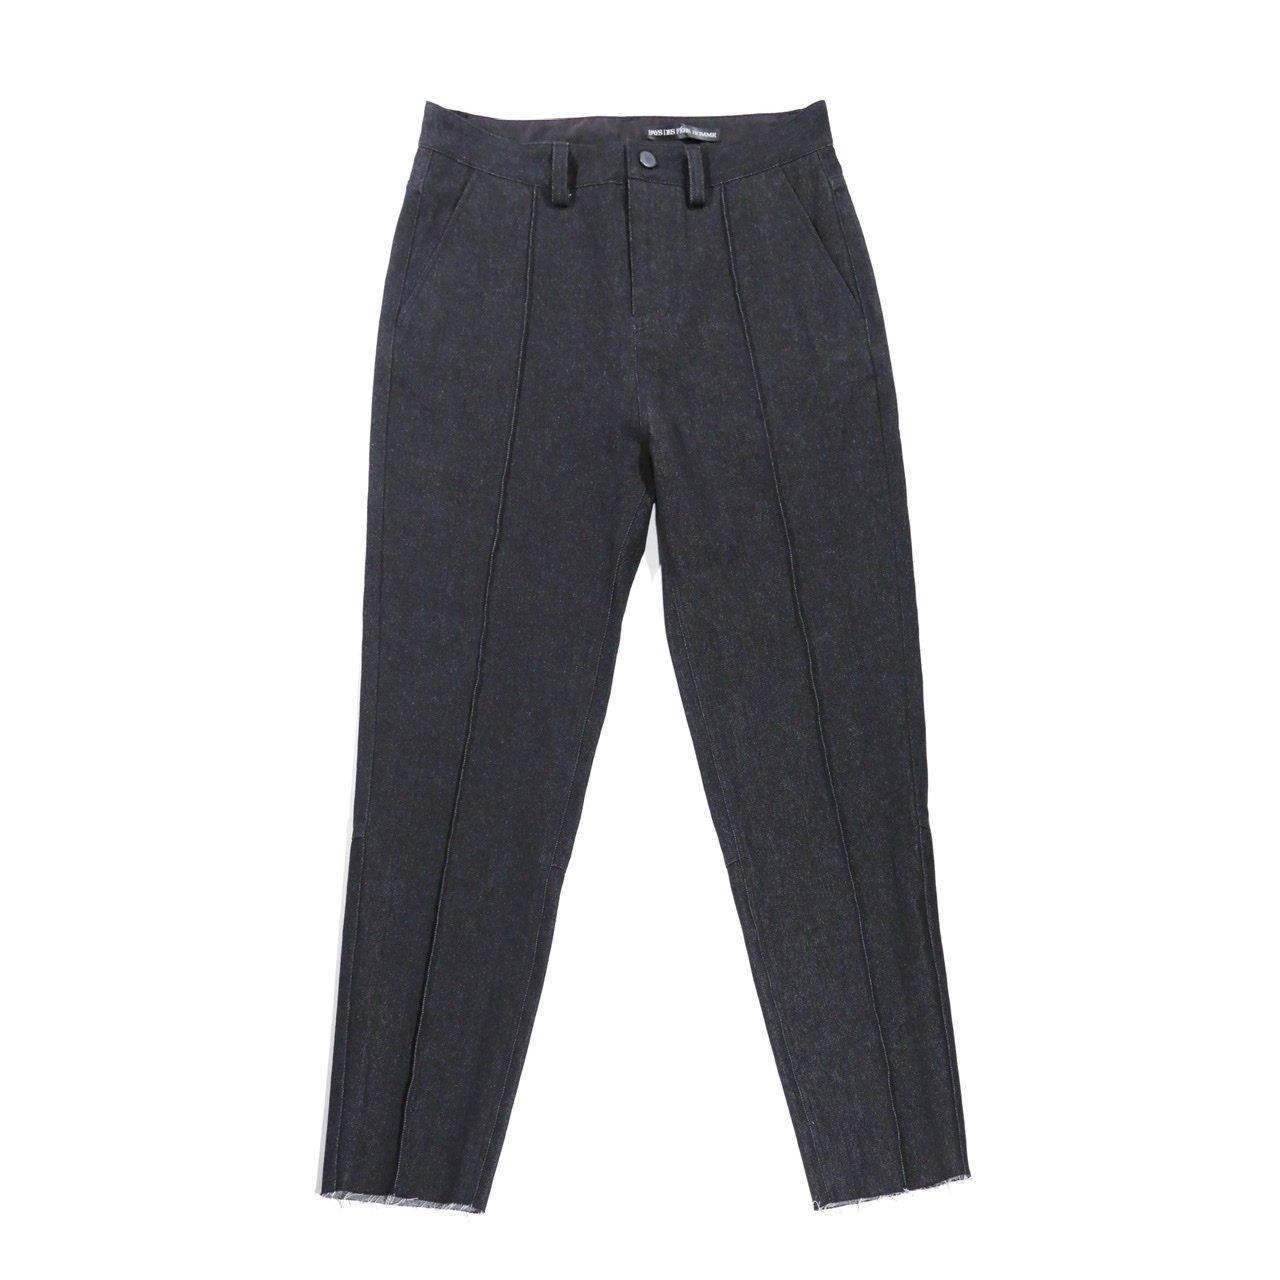 Black denim tapered pants (受注商品)